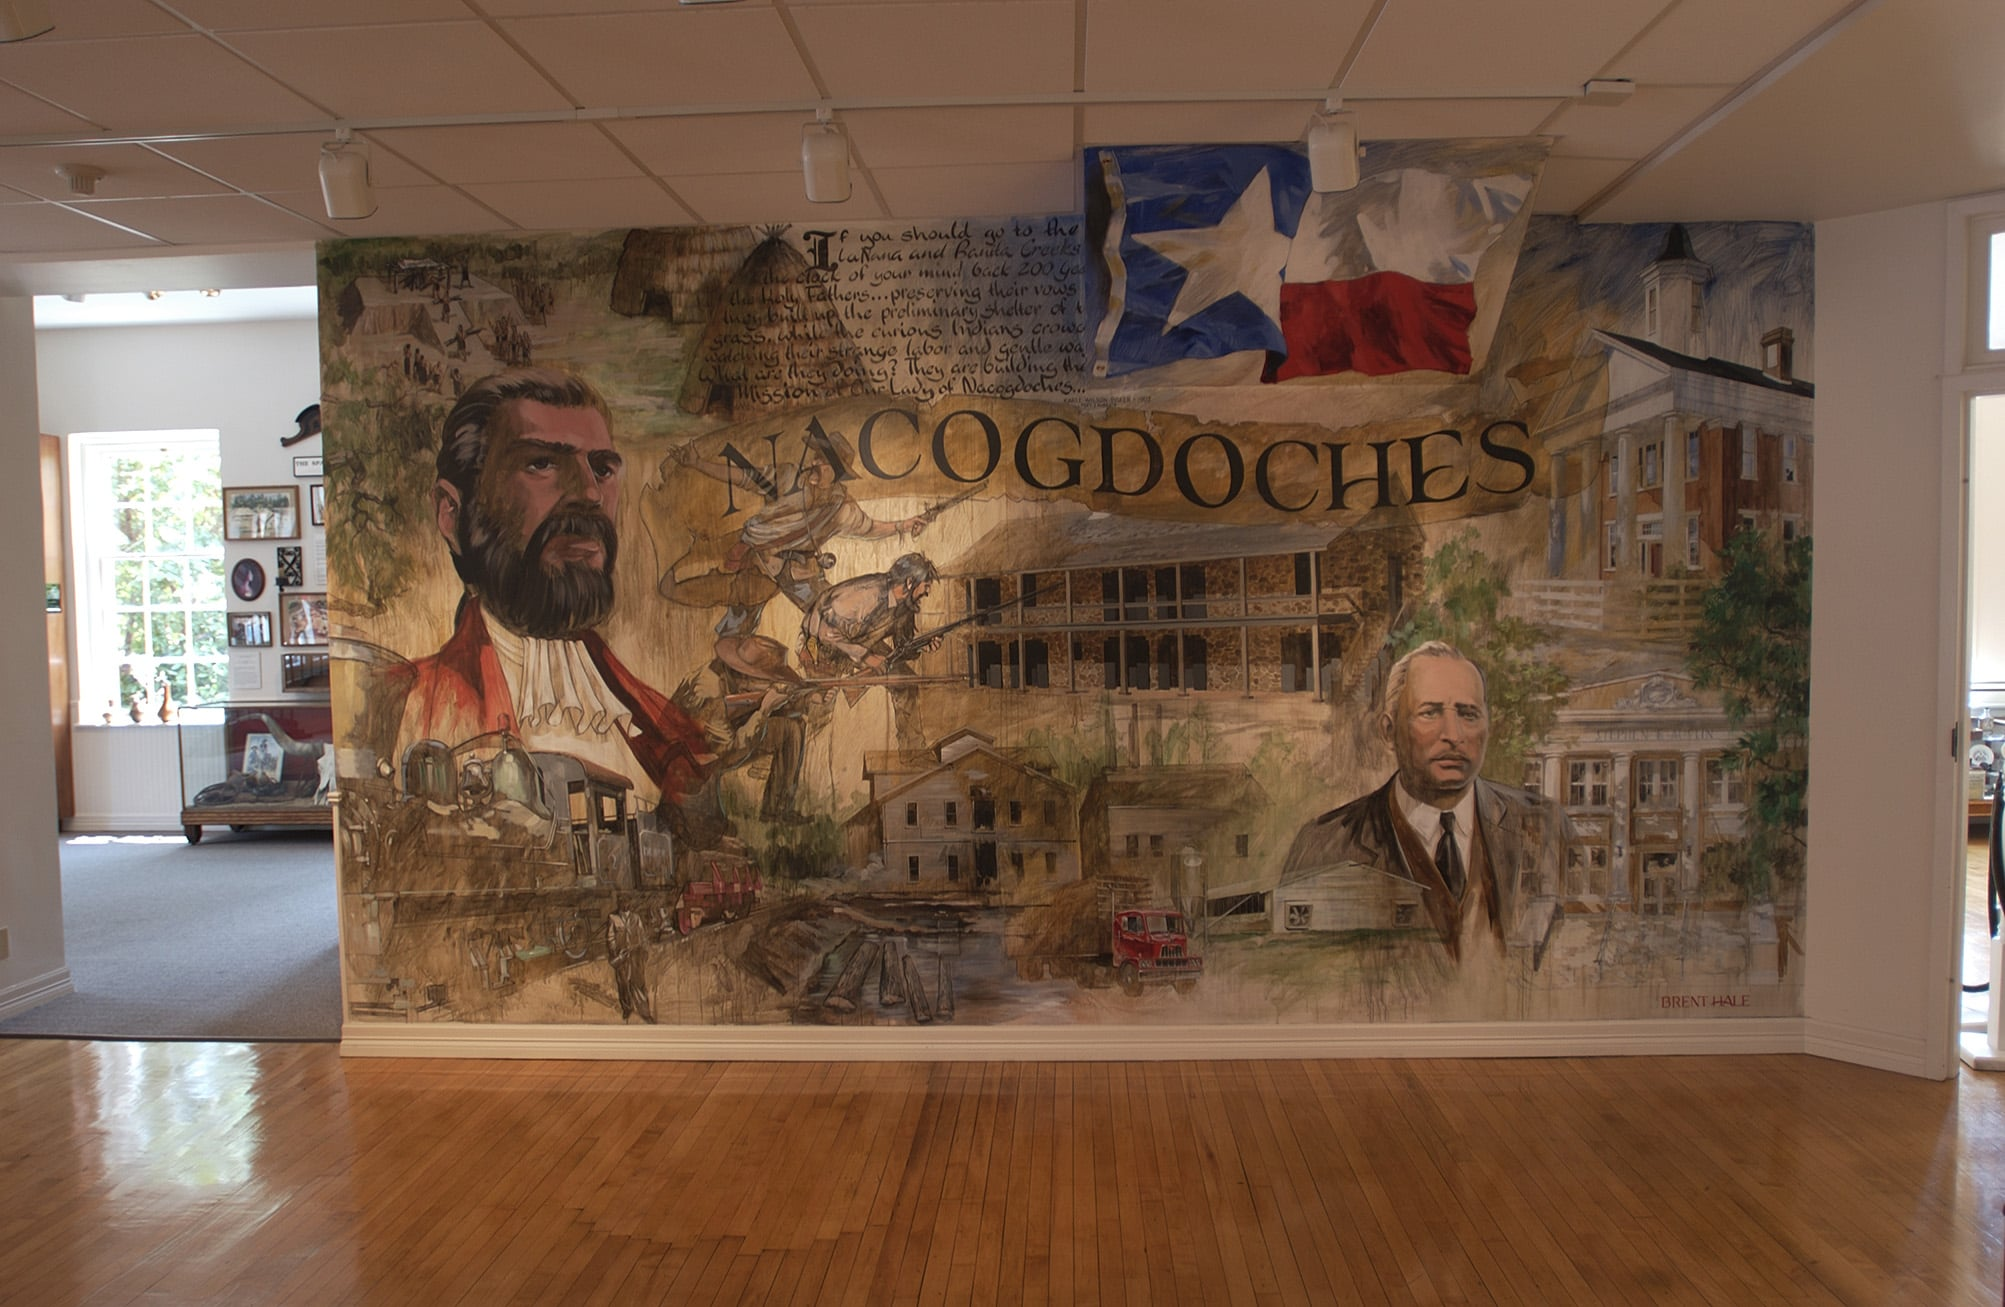 Nacogdoches Visitor's Center